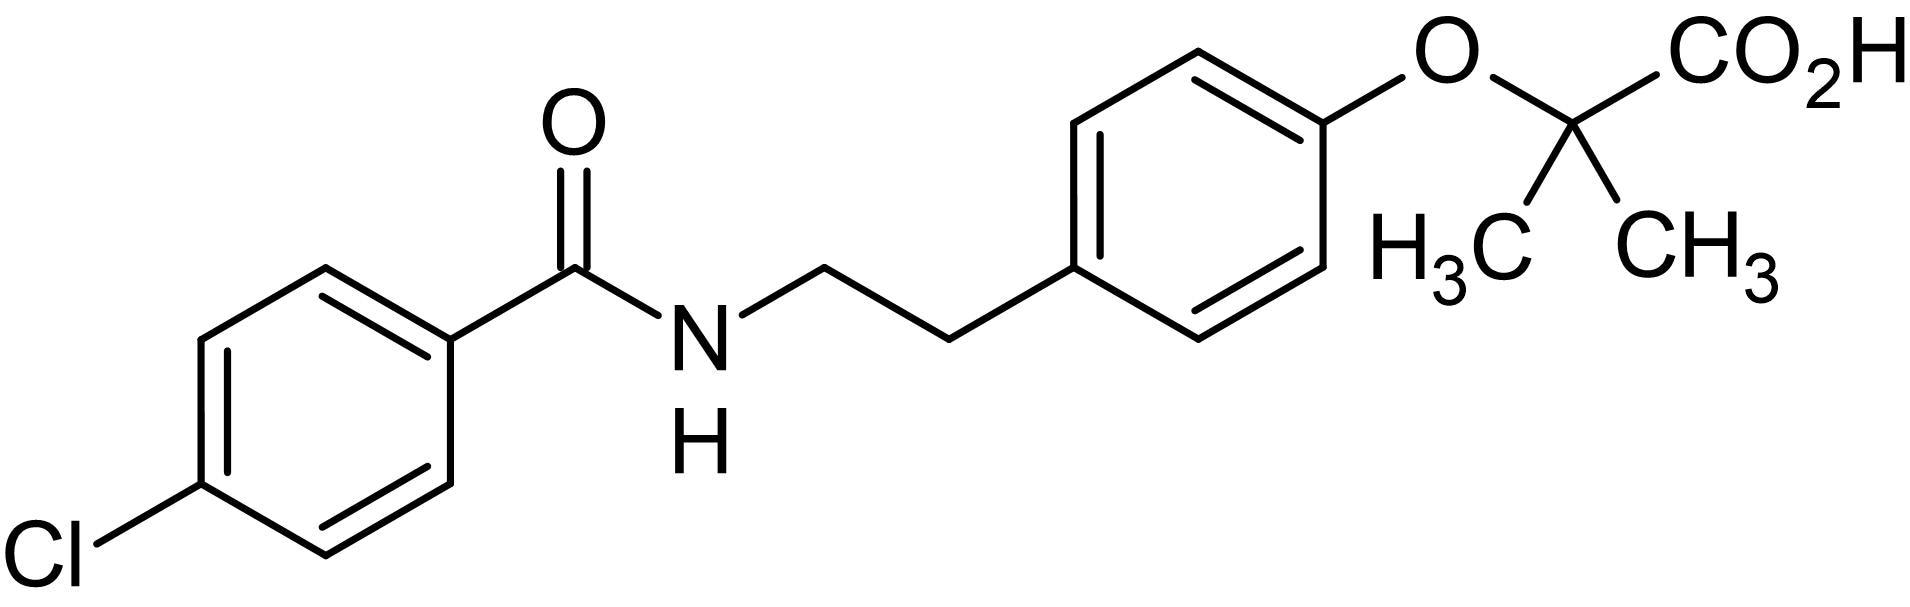 Chemical Structure - Bezafibrate, Pan-PPAR agonist (ab141233)